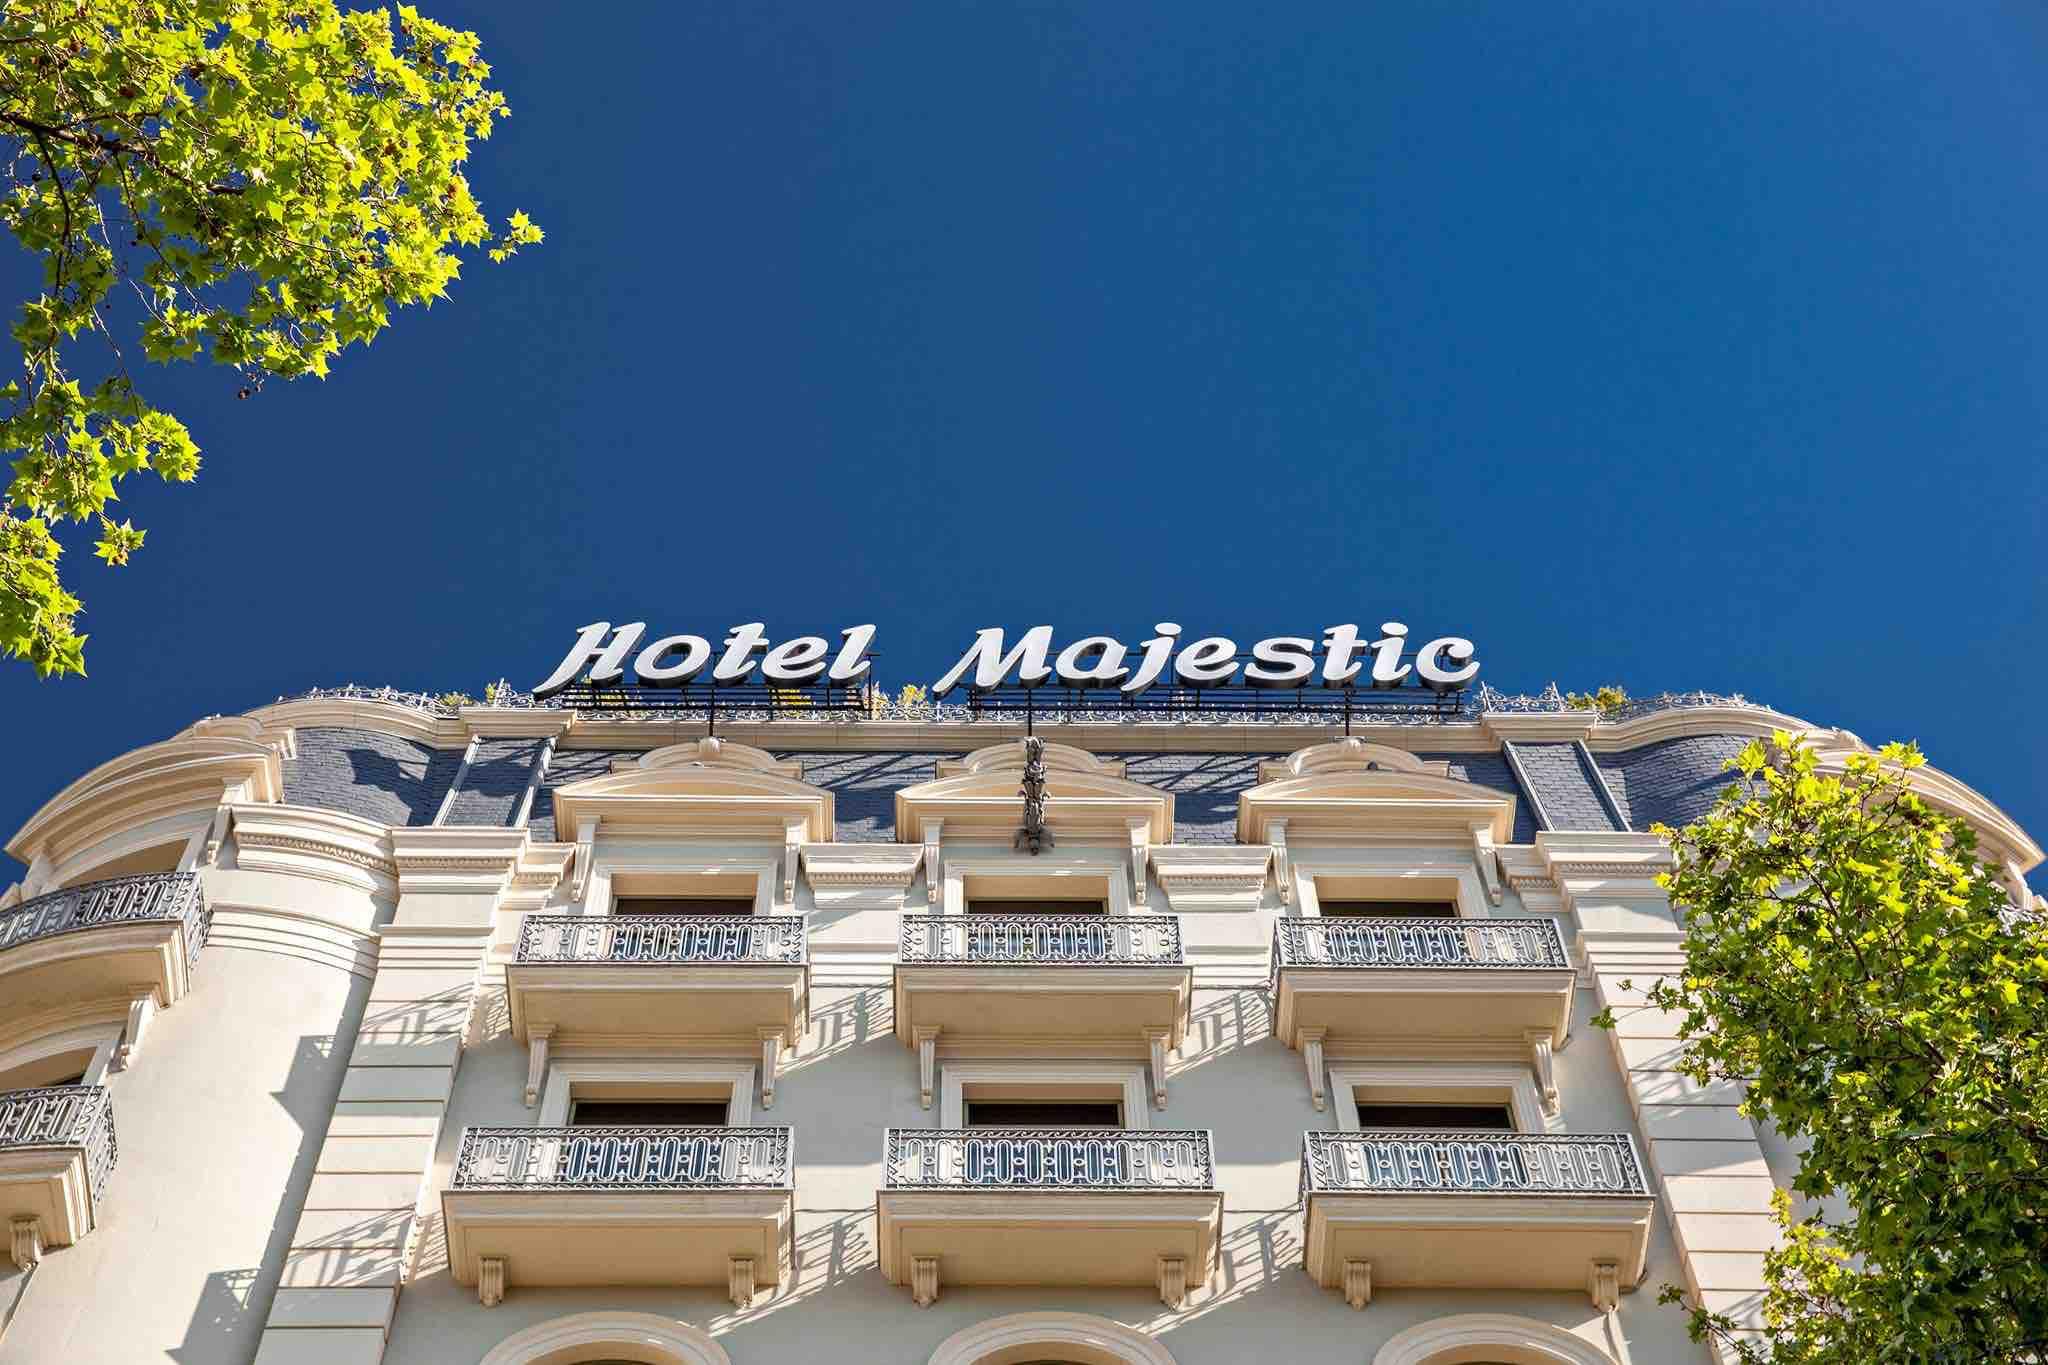 Majestic Hotel & Spa Barcelona exterior